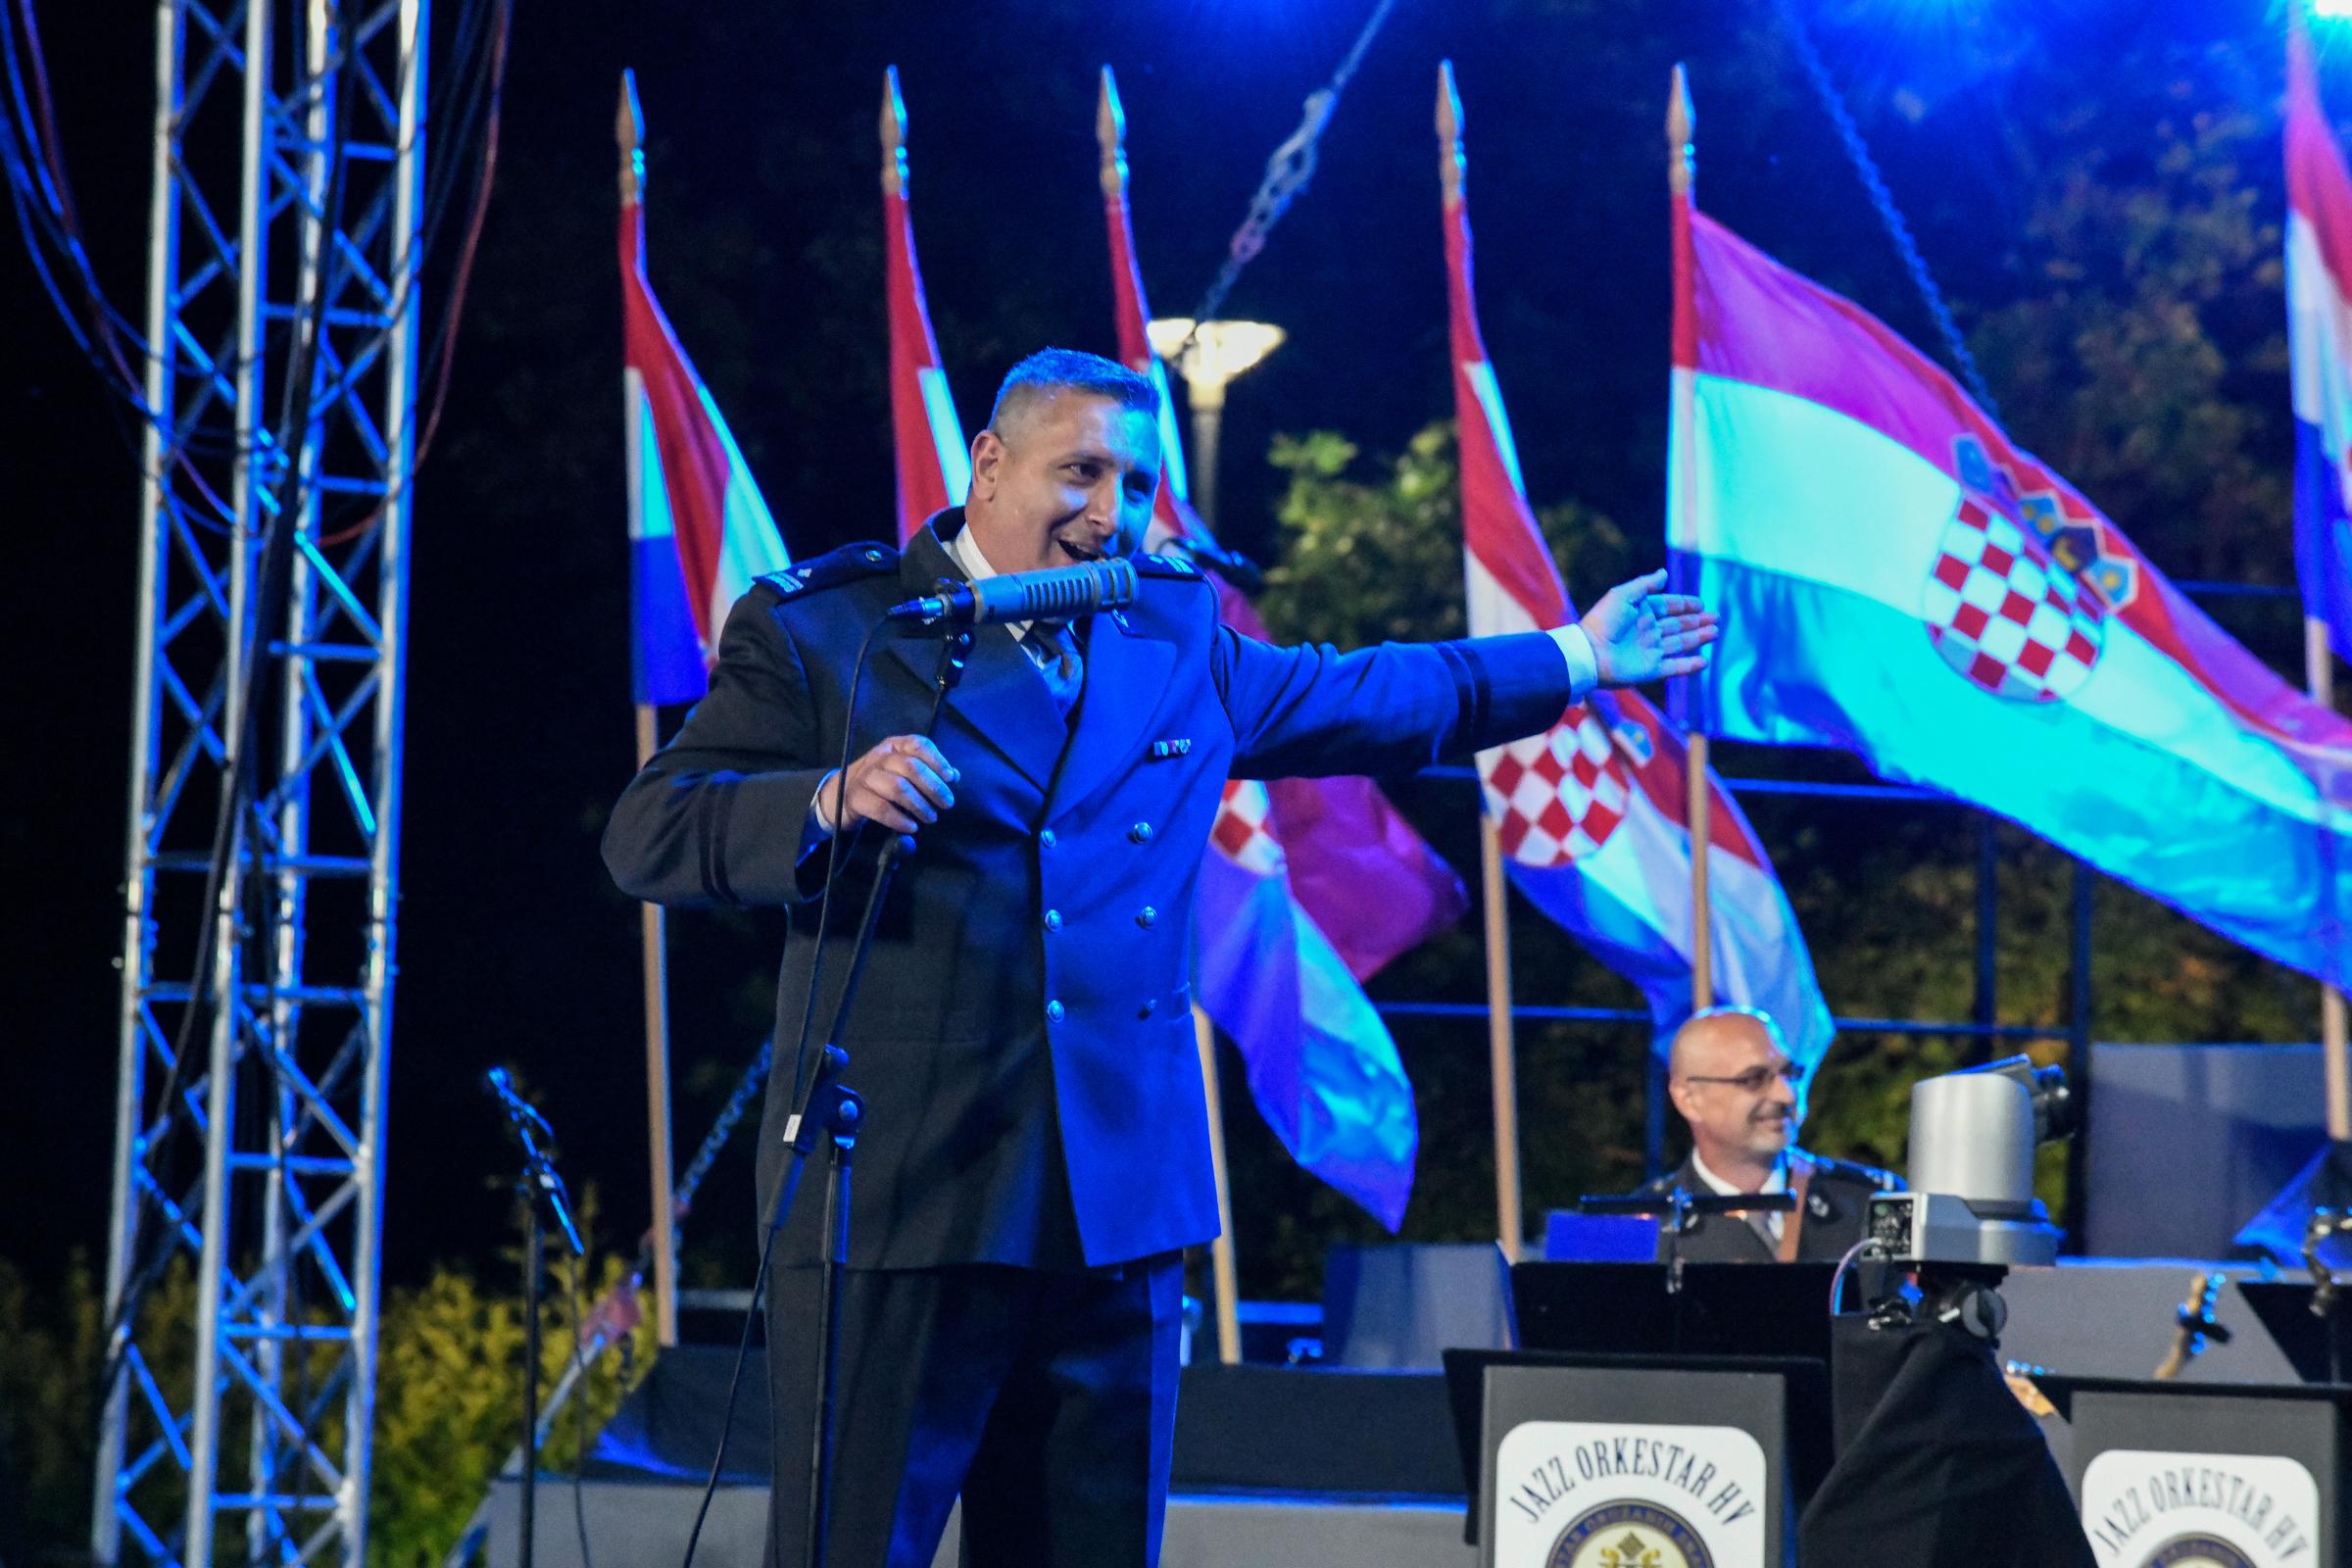 Glazbeni program Orkestra Oružanih snaga i US Army Banda Europe